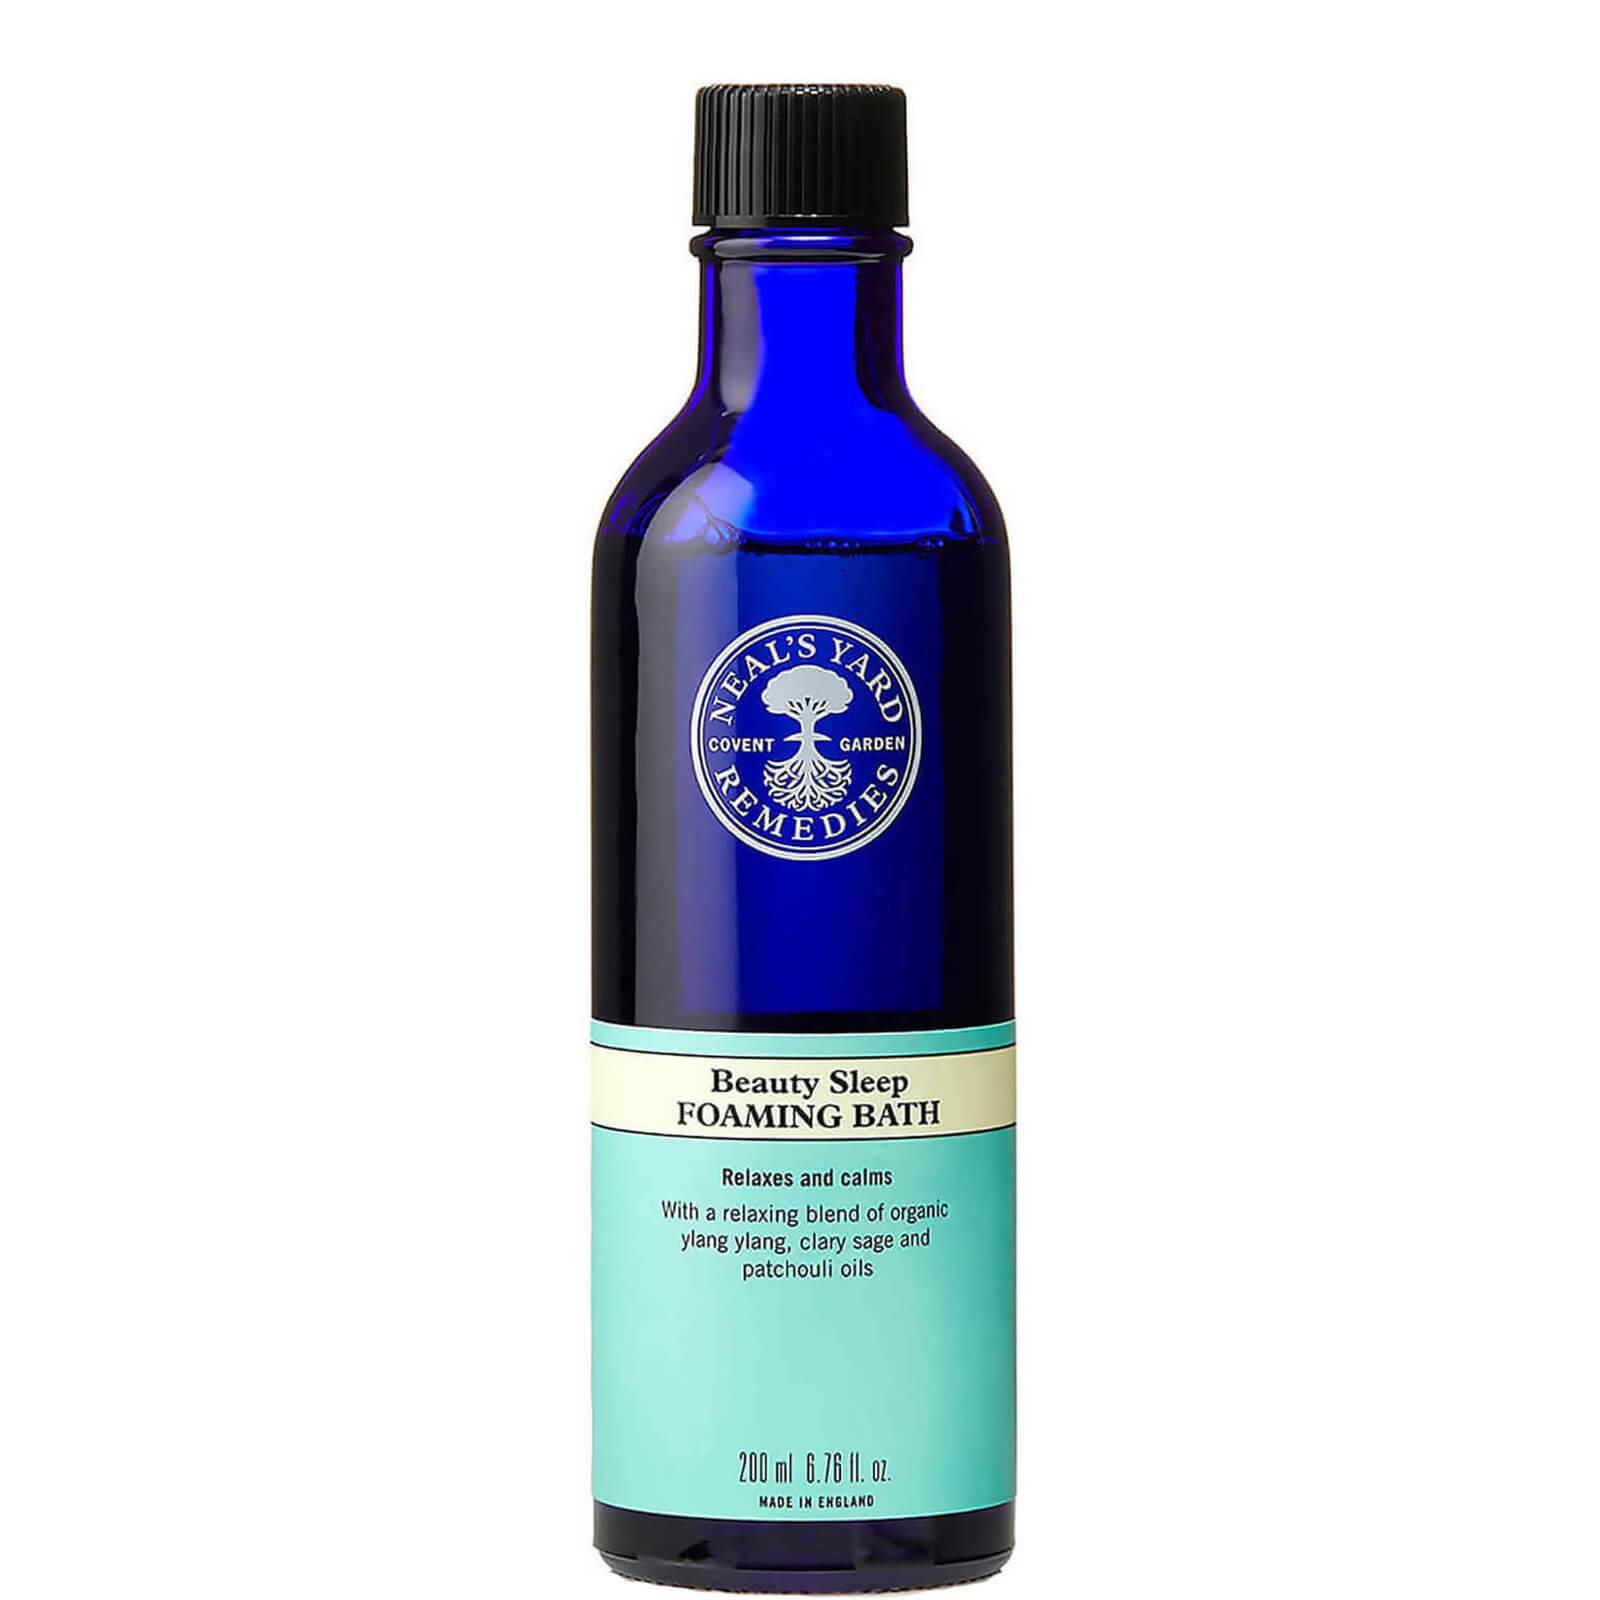 Neal's Yard Remedies Beauty Sleep Foaming Bath 200ml